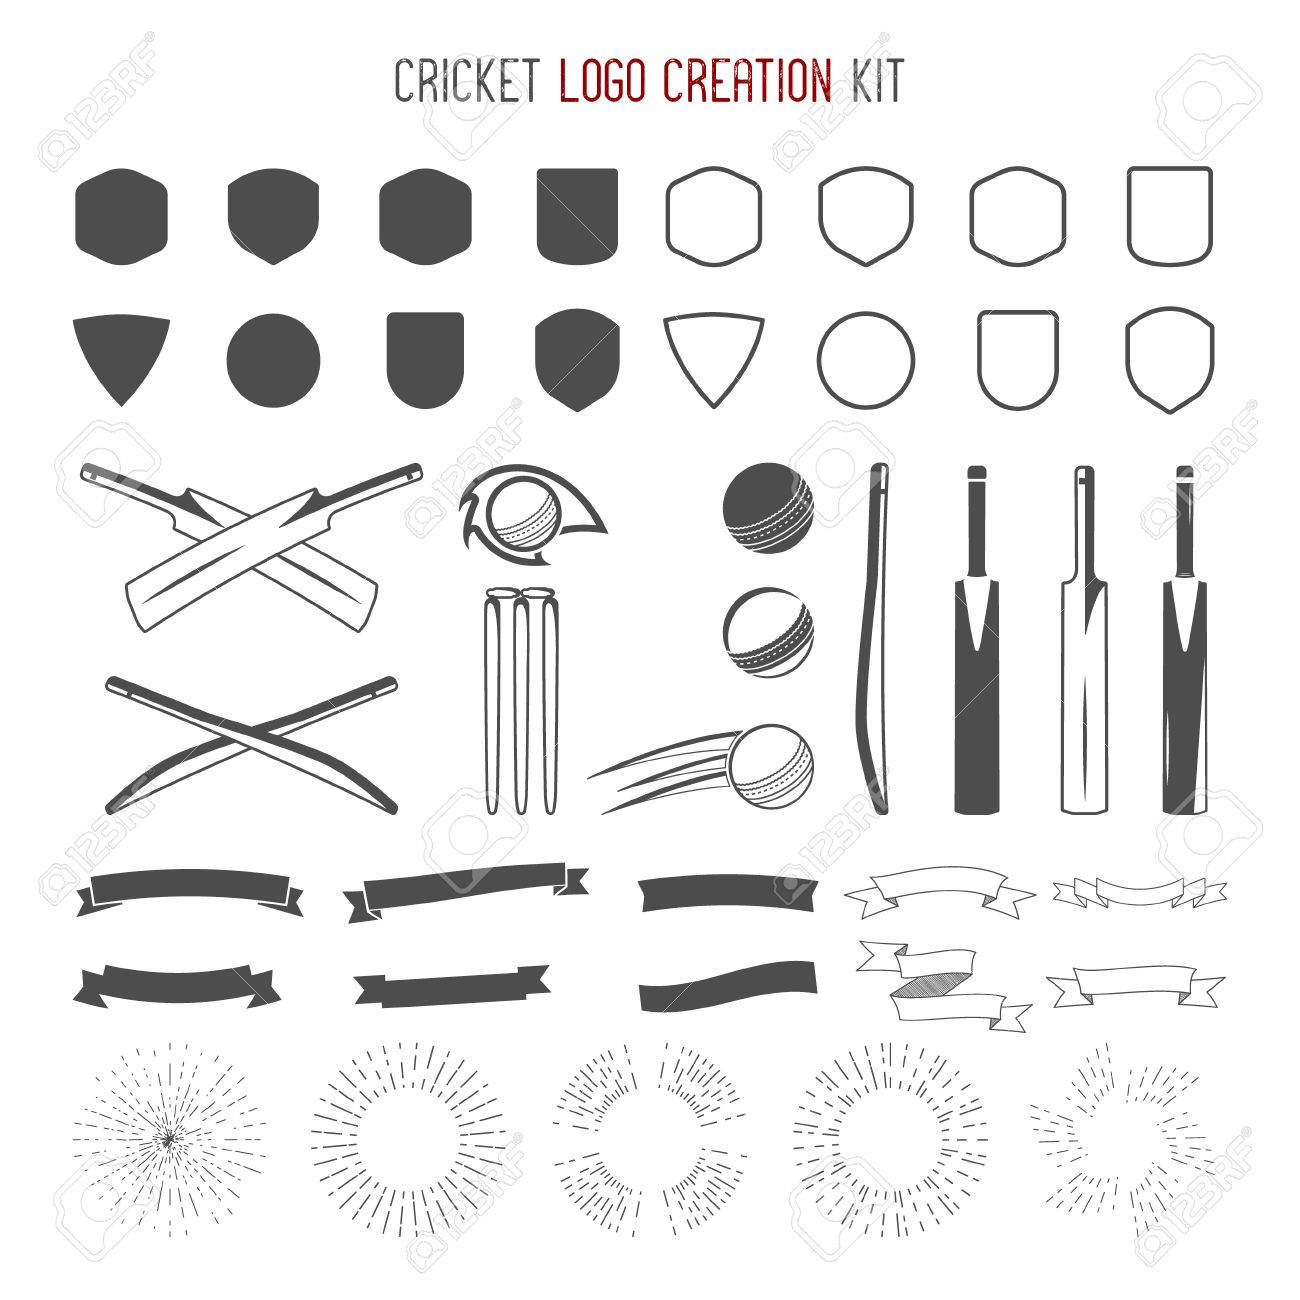 Cricket icon creation kit sports designs icons set create sports designs icons set create your own emblem design biocorpaavc Gallery